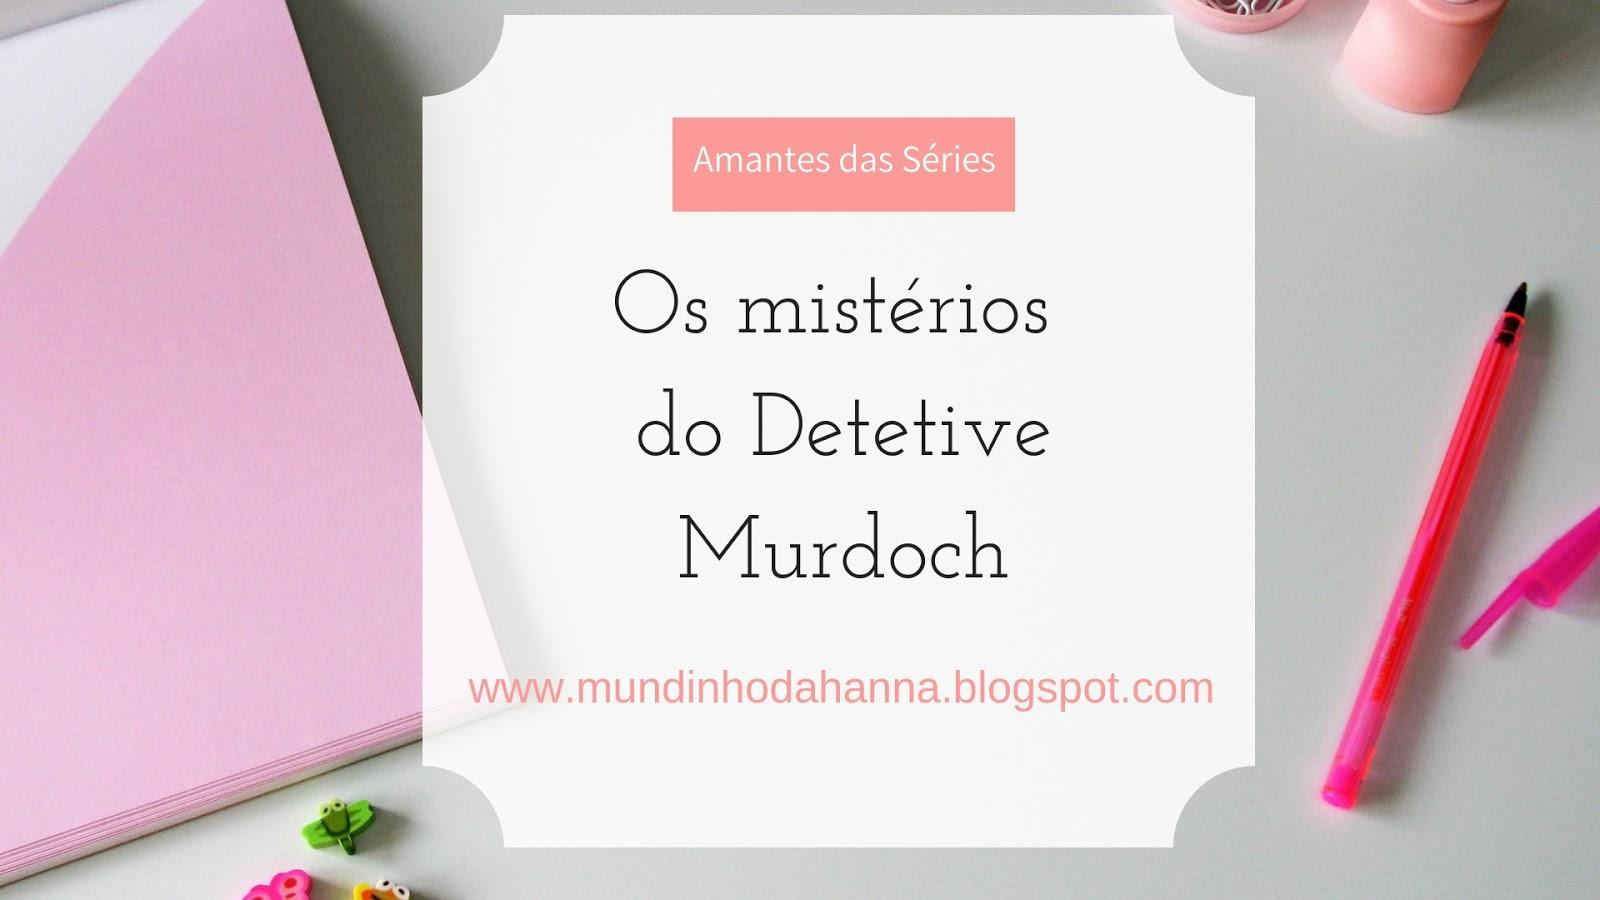 Os mistérios do detetive Murdoch